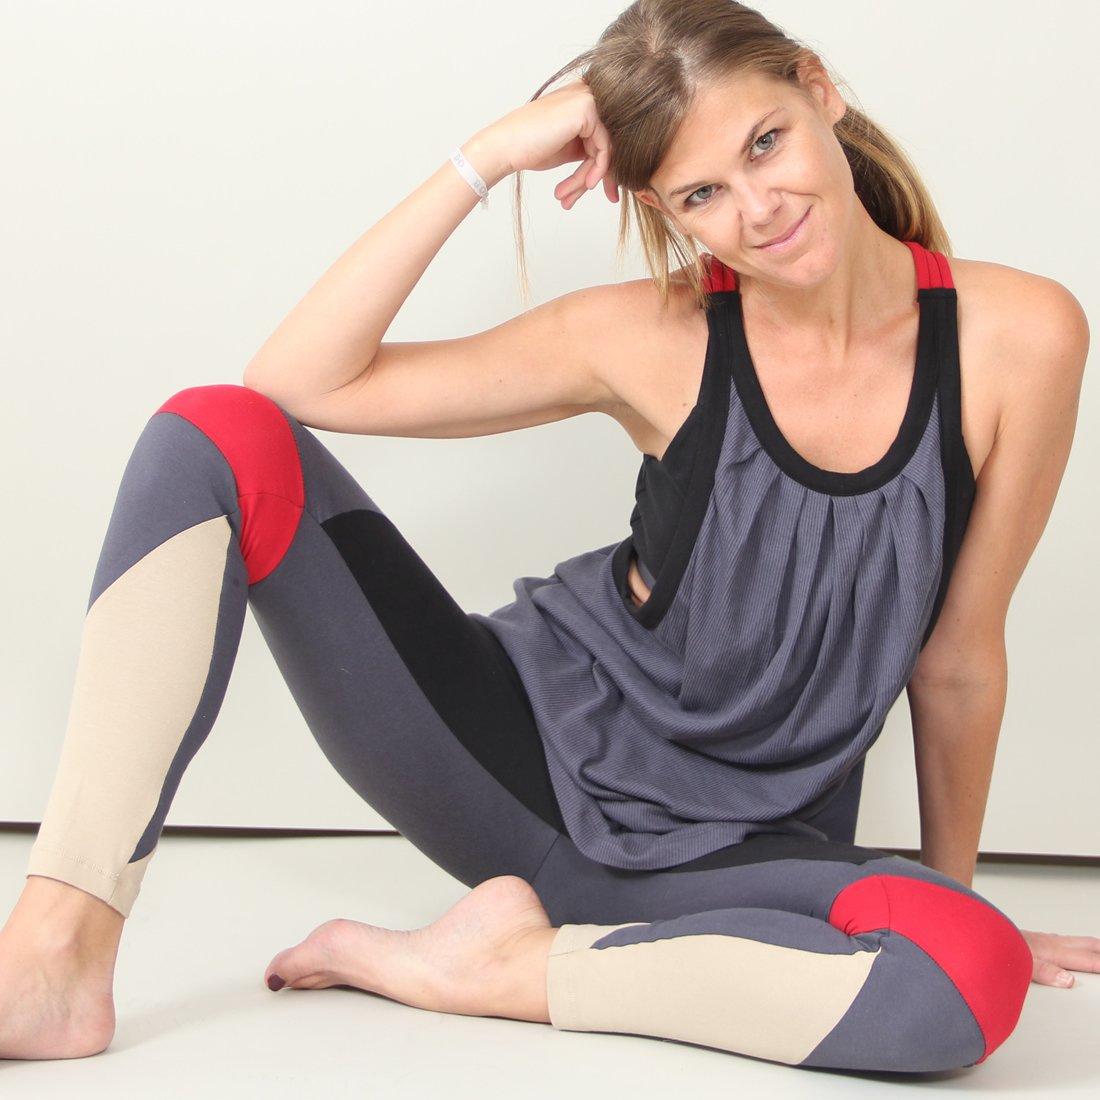 Galapagos color-Blocco yoga leggings, Color Block Red, XL